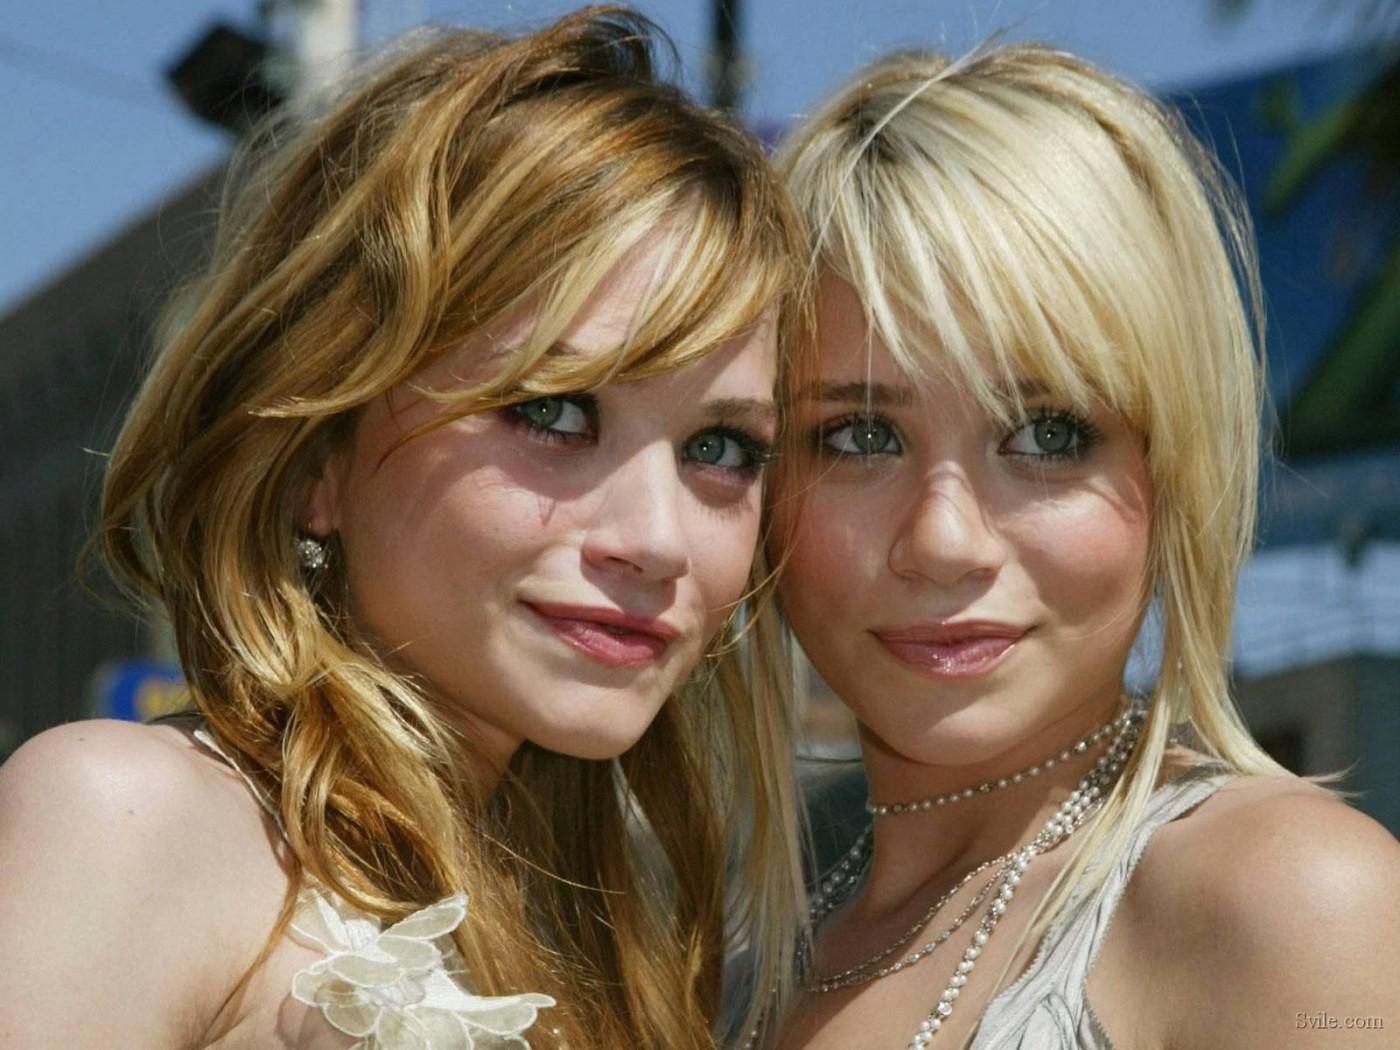 Сёстры милтон фото, Фотографии Marissa and Melissa Milton Milton Twins 14 15 фотография